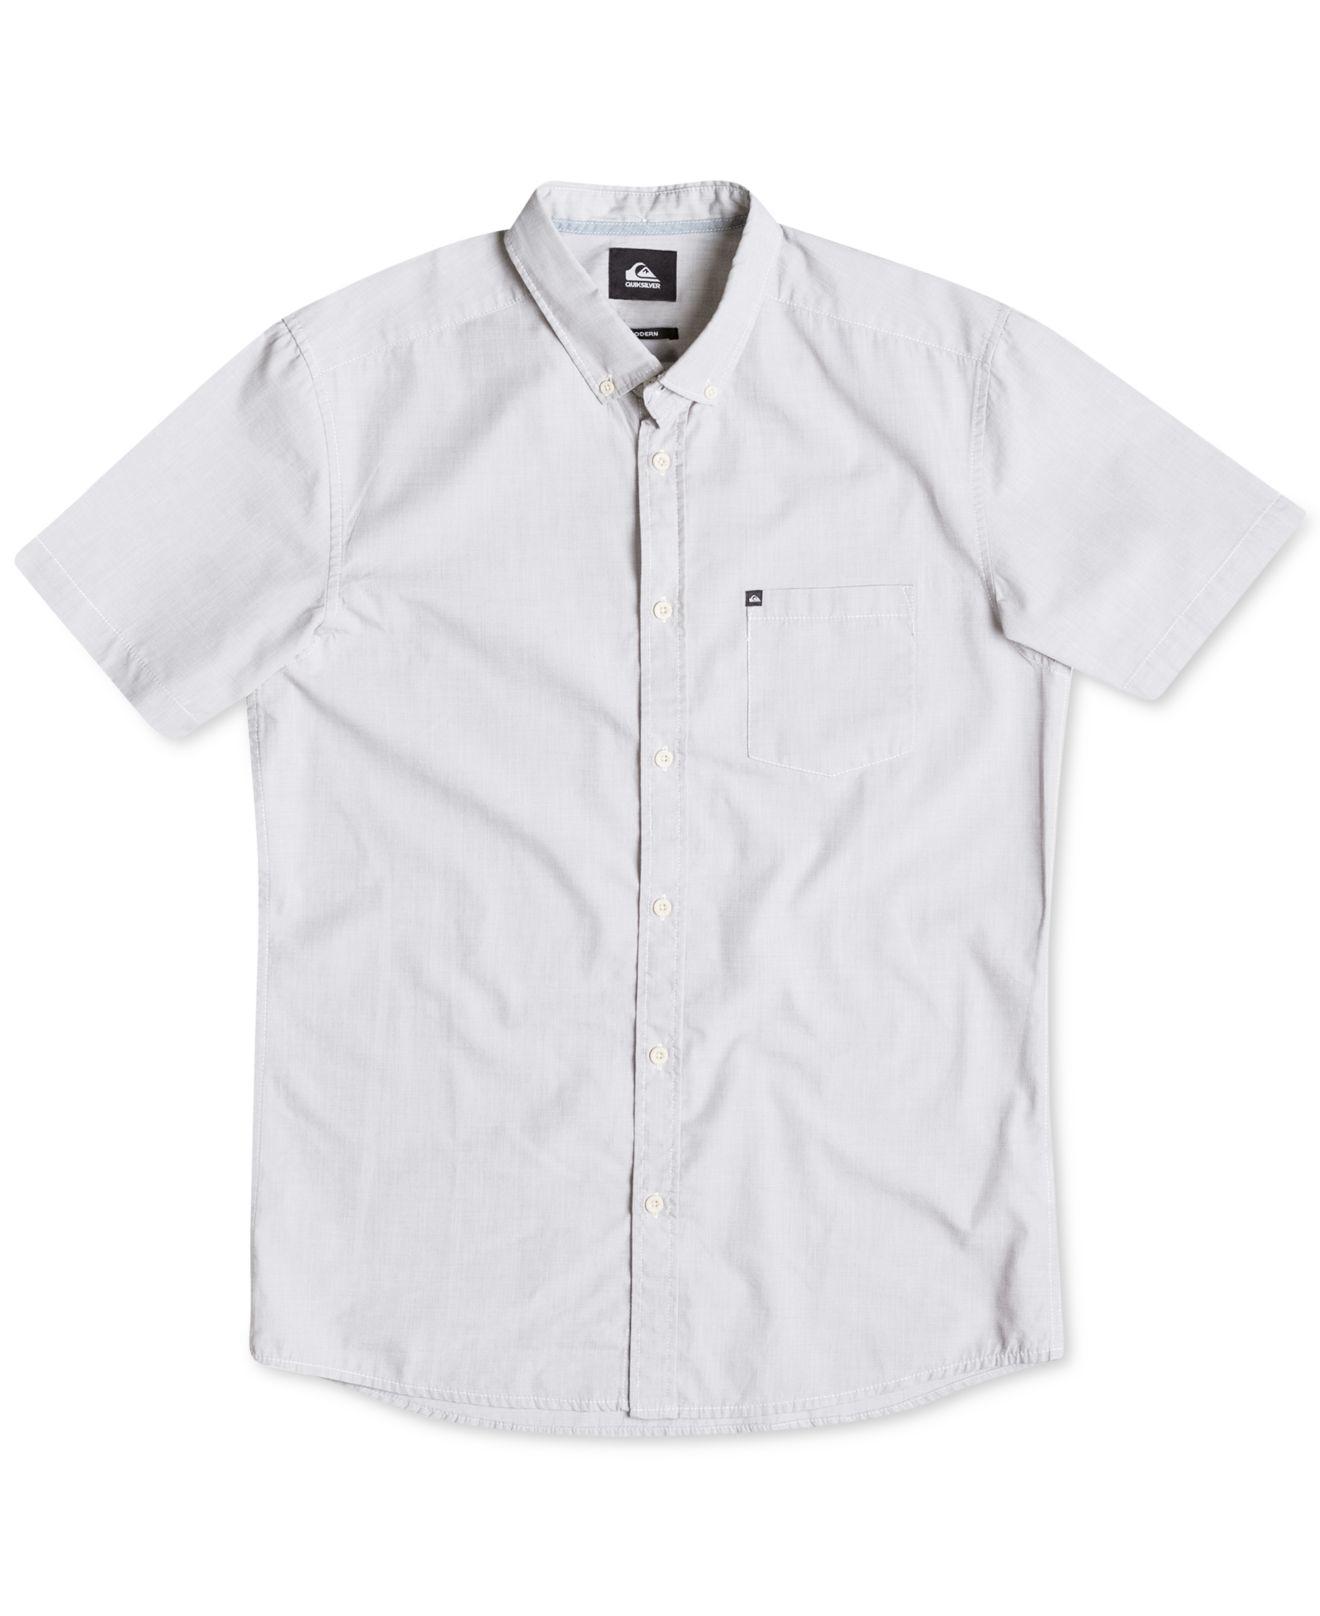 Quiksilver men 39 s chambray button down short sleeve shirt for Mens grey button down dress shirt